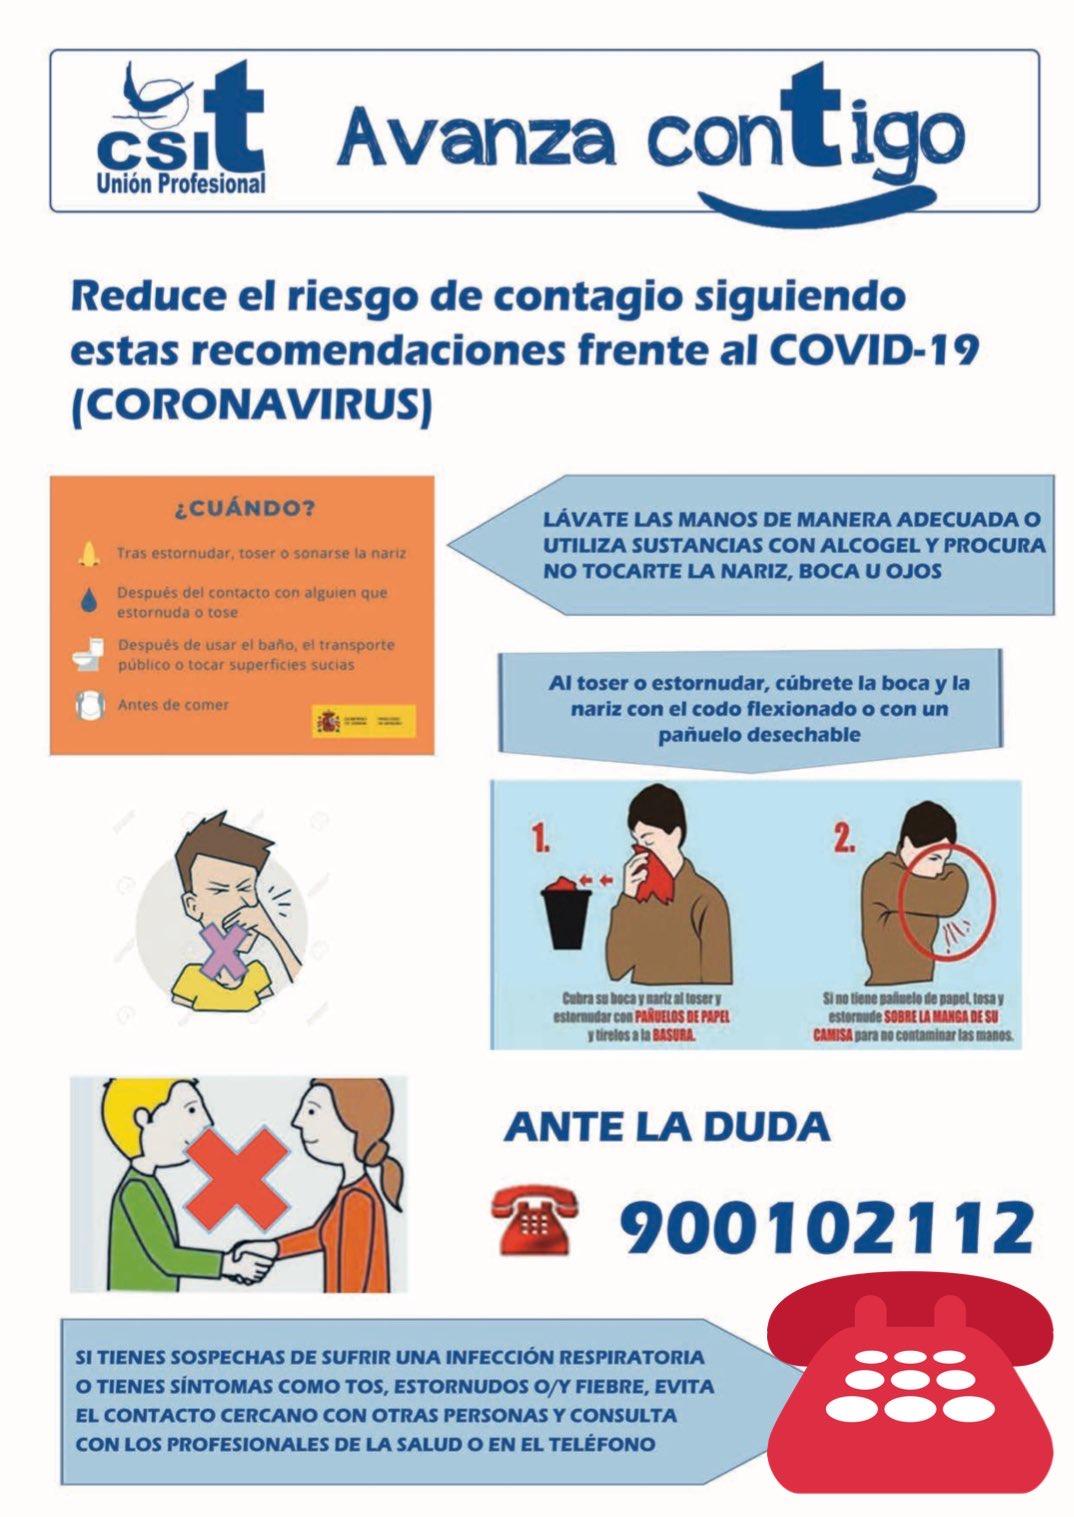 Recomendaciones para reducir contagio Coronavirus